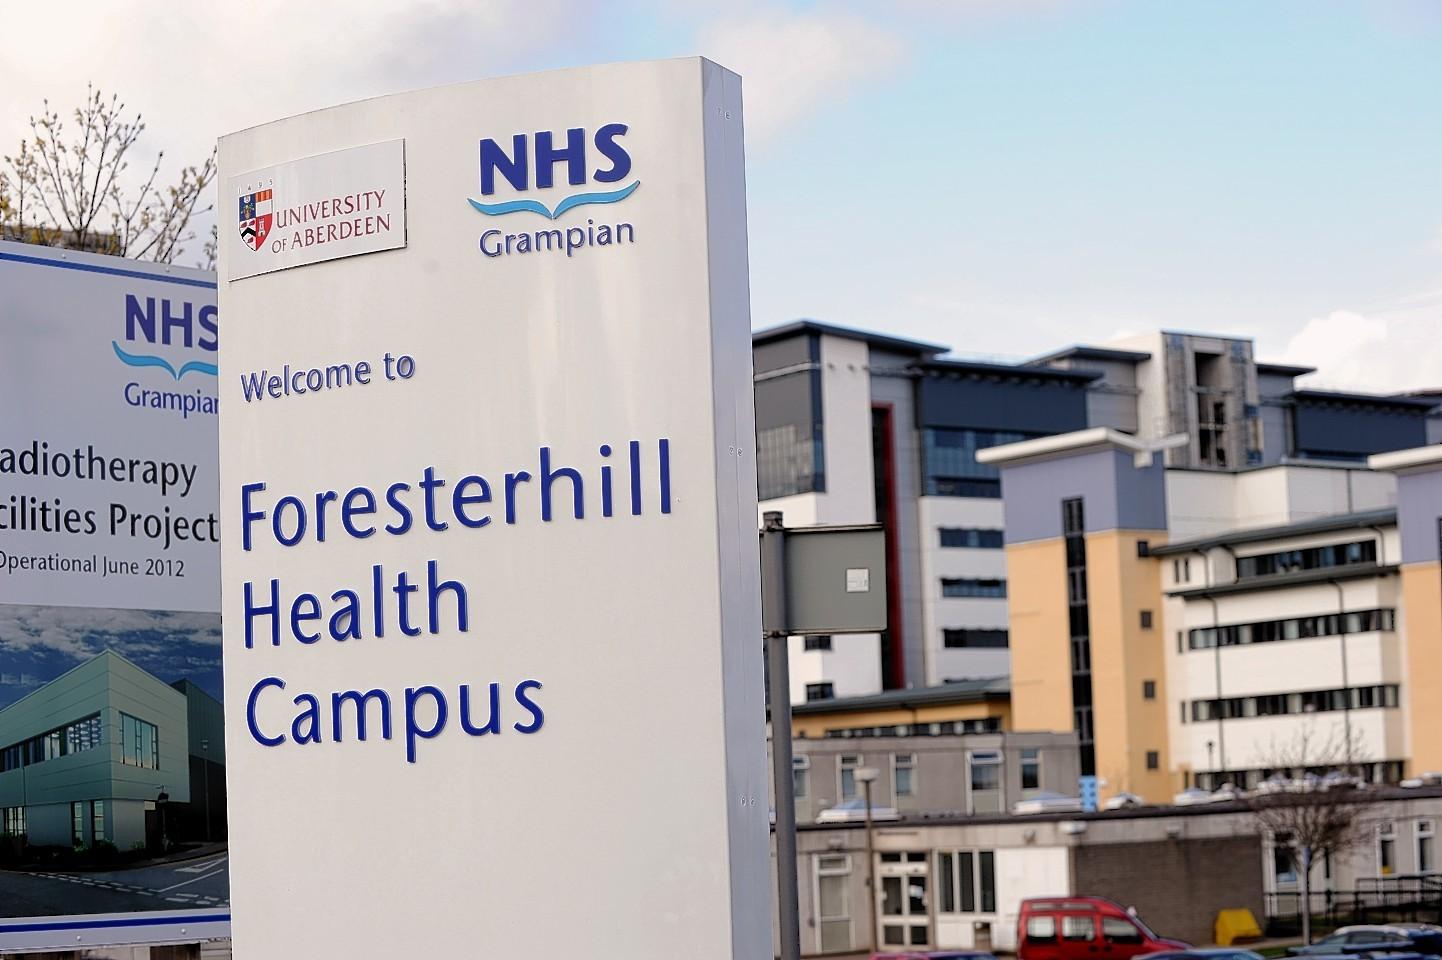 Foresterhill health campus